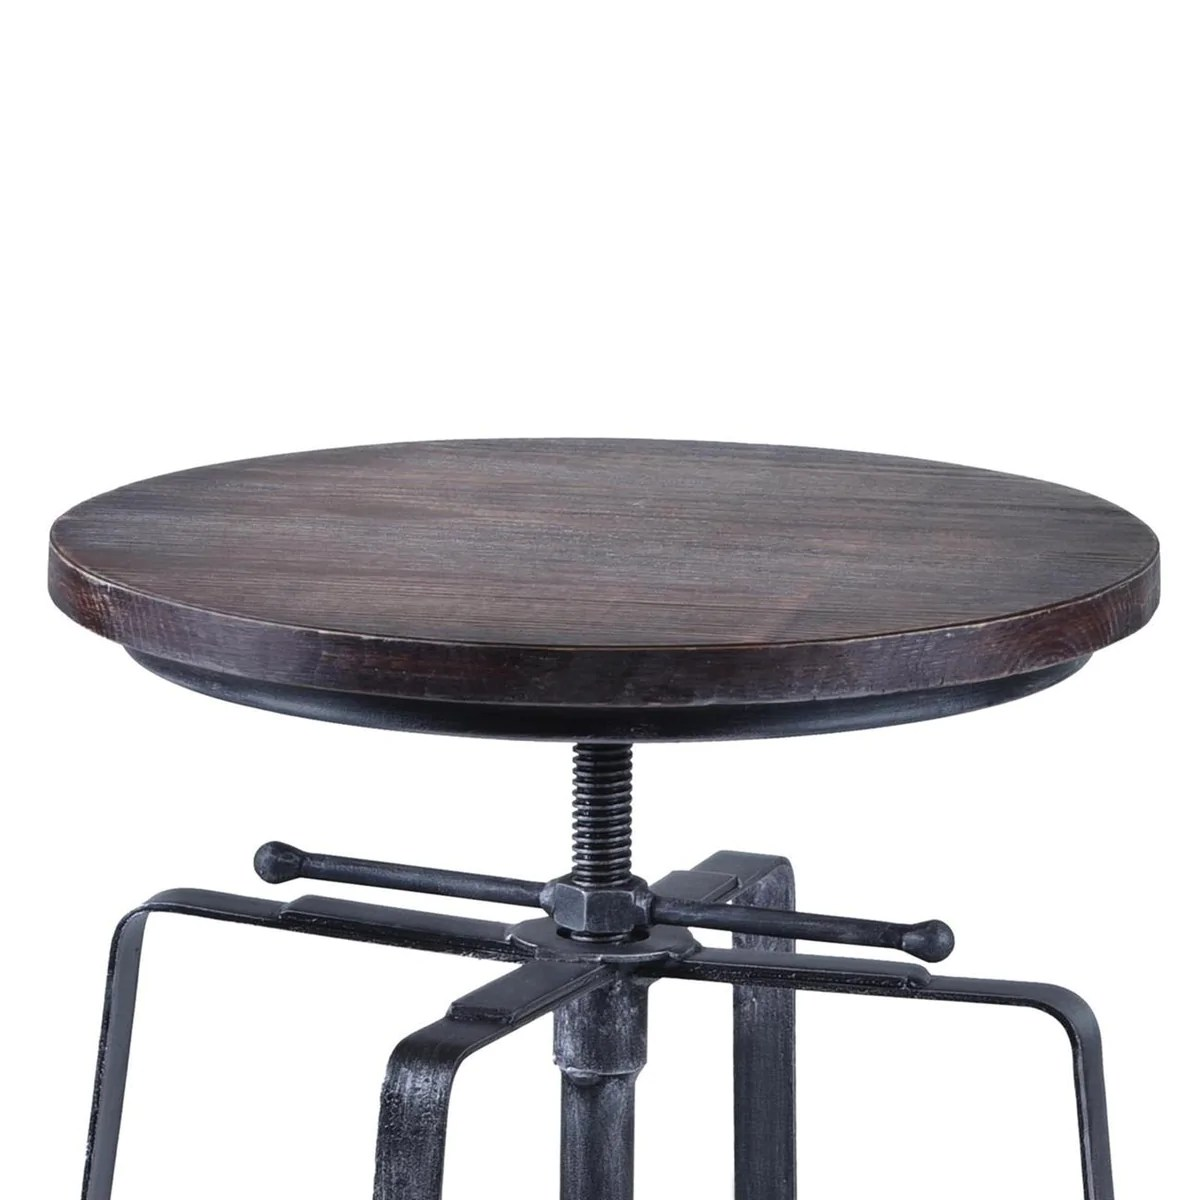 chair cba steel ball office armen living bronx adjustable barstool in industrial grey